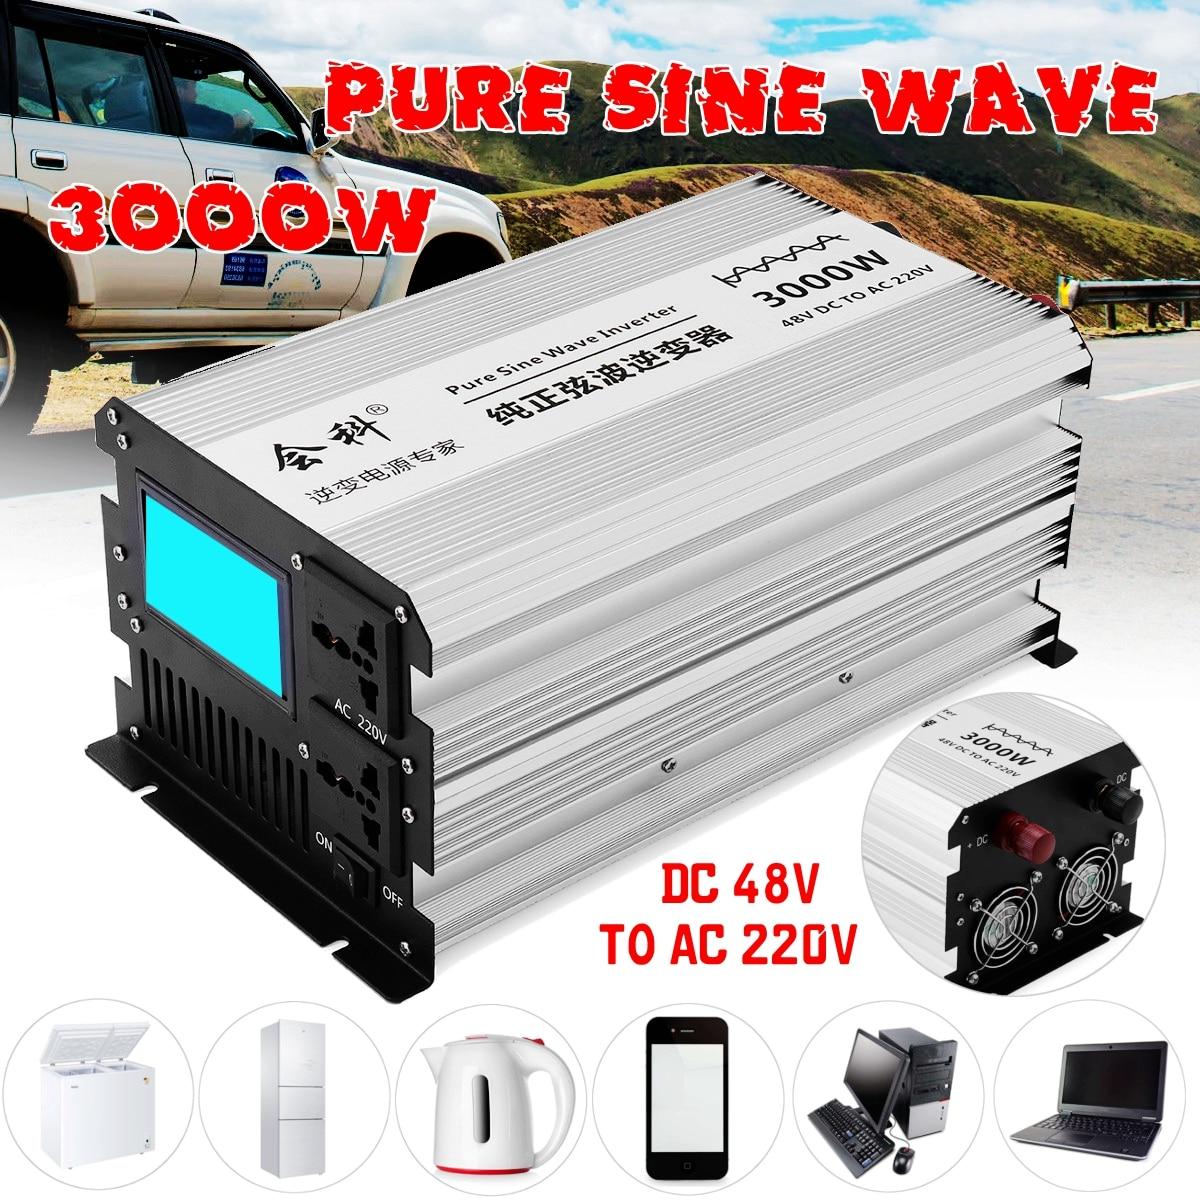 Inverter onda sinusoidale pura 1500 W 3000 W Picchi 12 v/24 v/48 v per AC110v/ 220 v display LCD Inverter di potenza di alimentazione